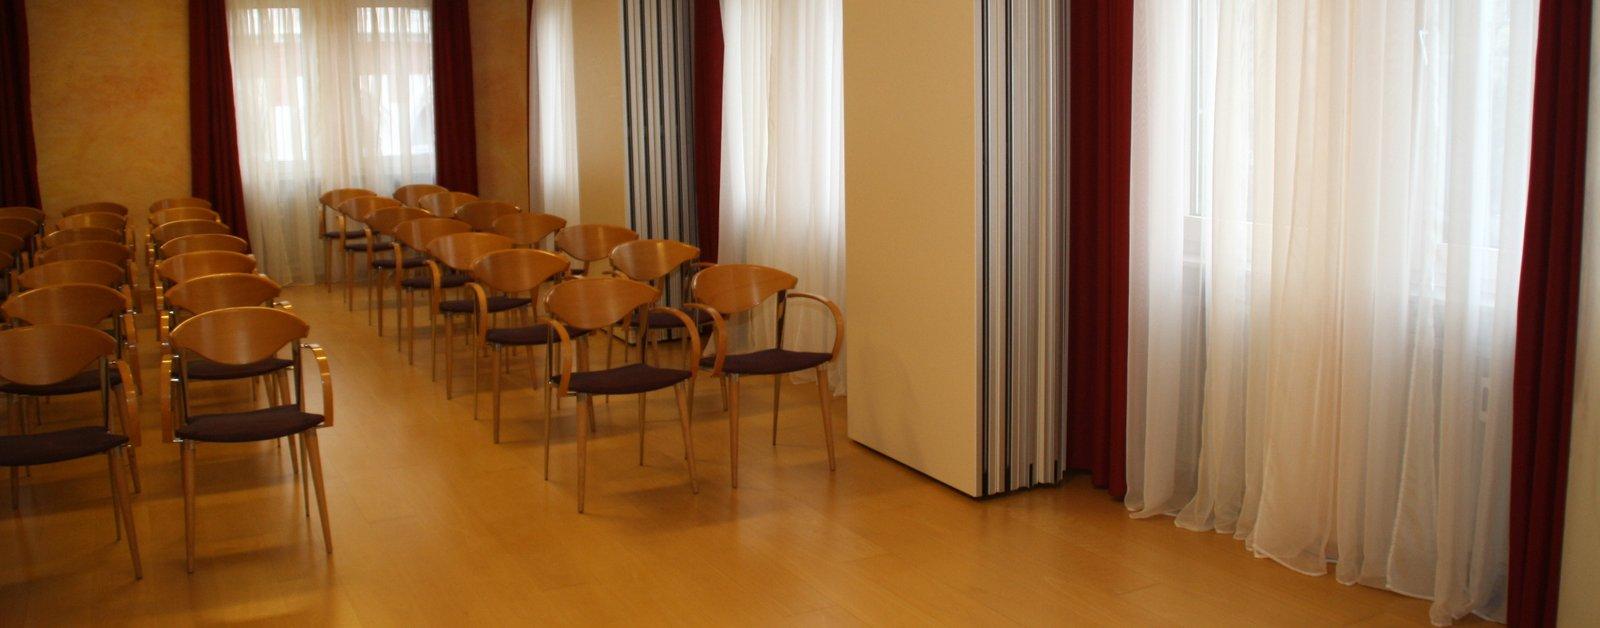 einblick in die r ume wandelplatz. Black Bedroom Furniture Sets. Home Design Ideas